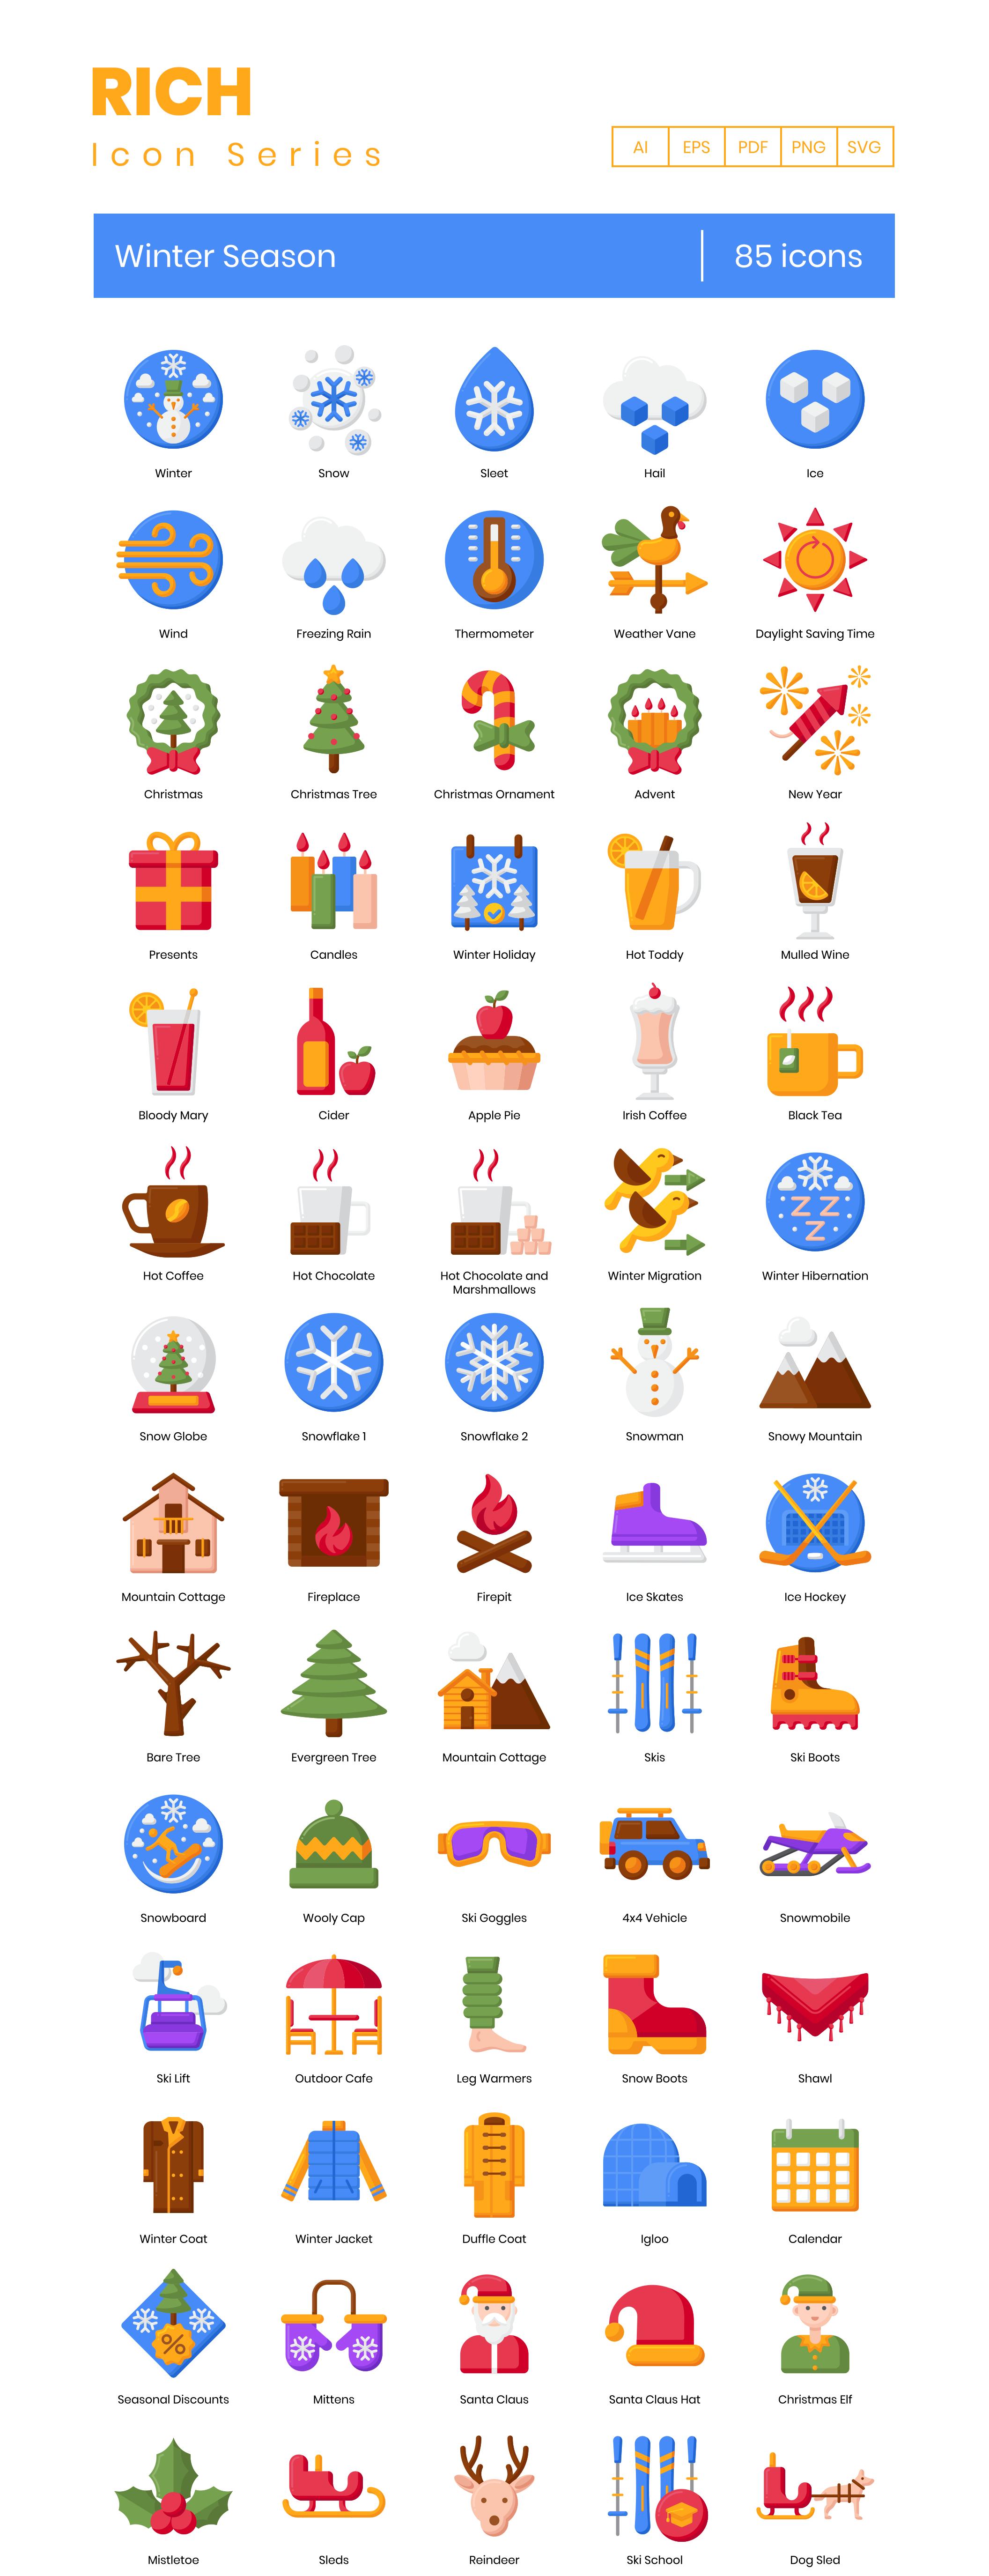 Winter Season Icon Set Preview Image